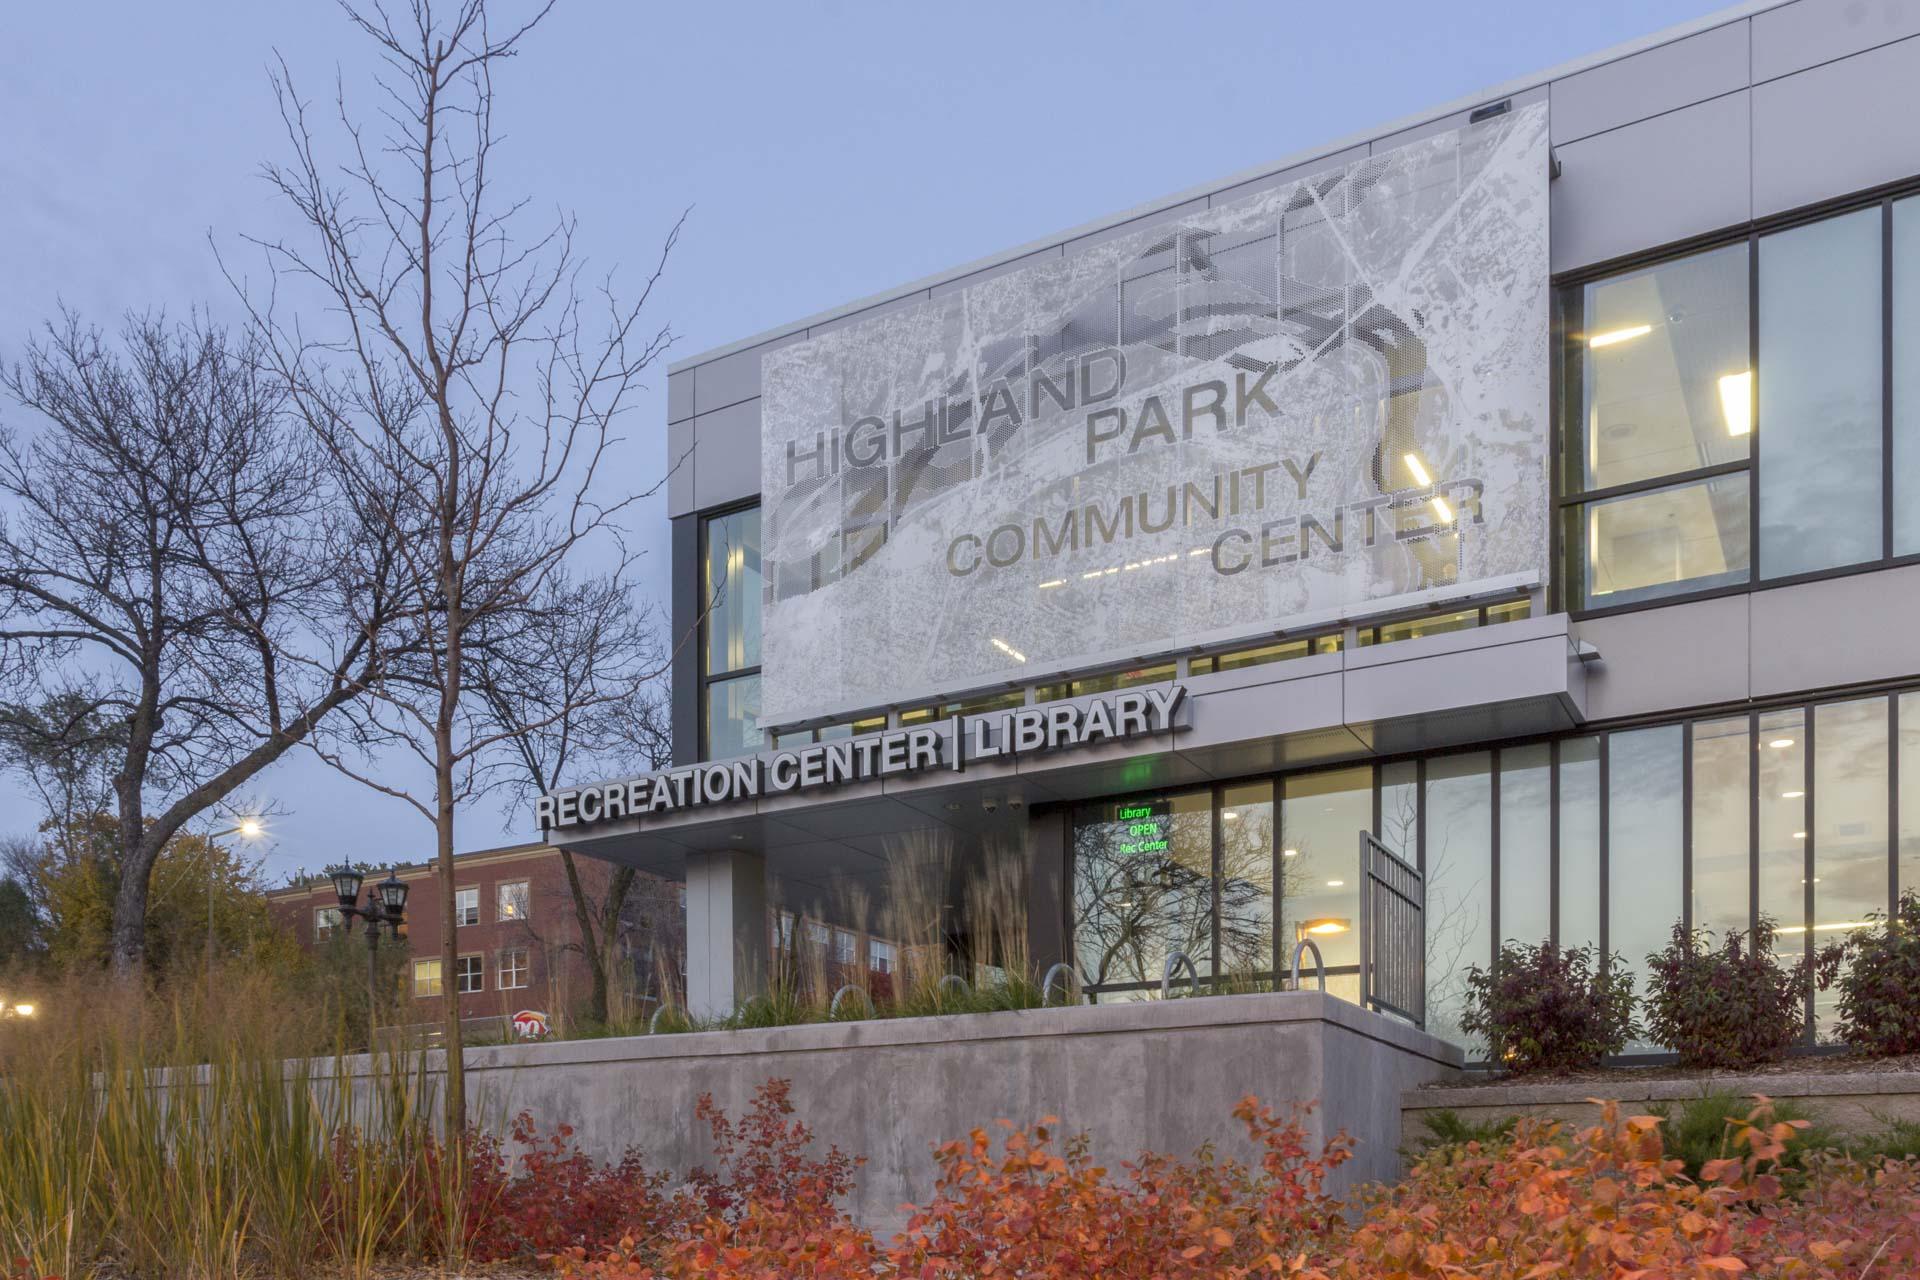 Highland Park Community Center in St. Paul, Minnesota.